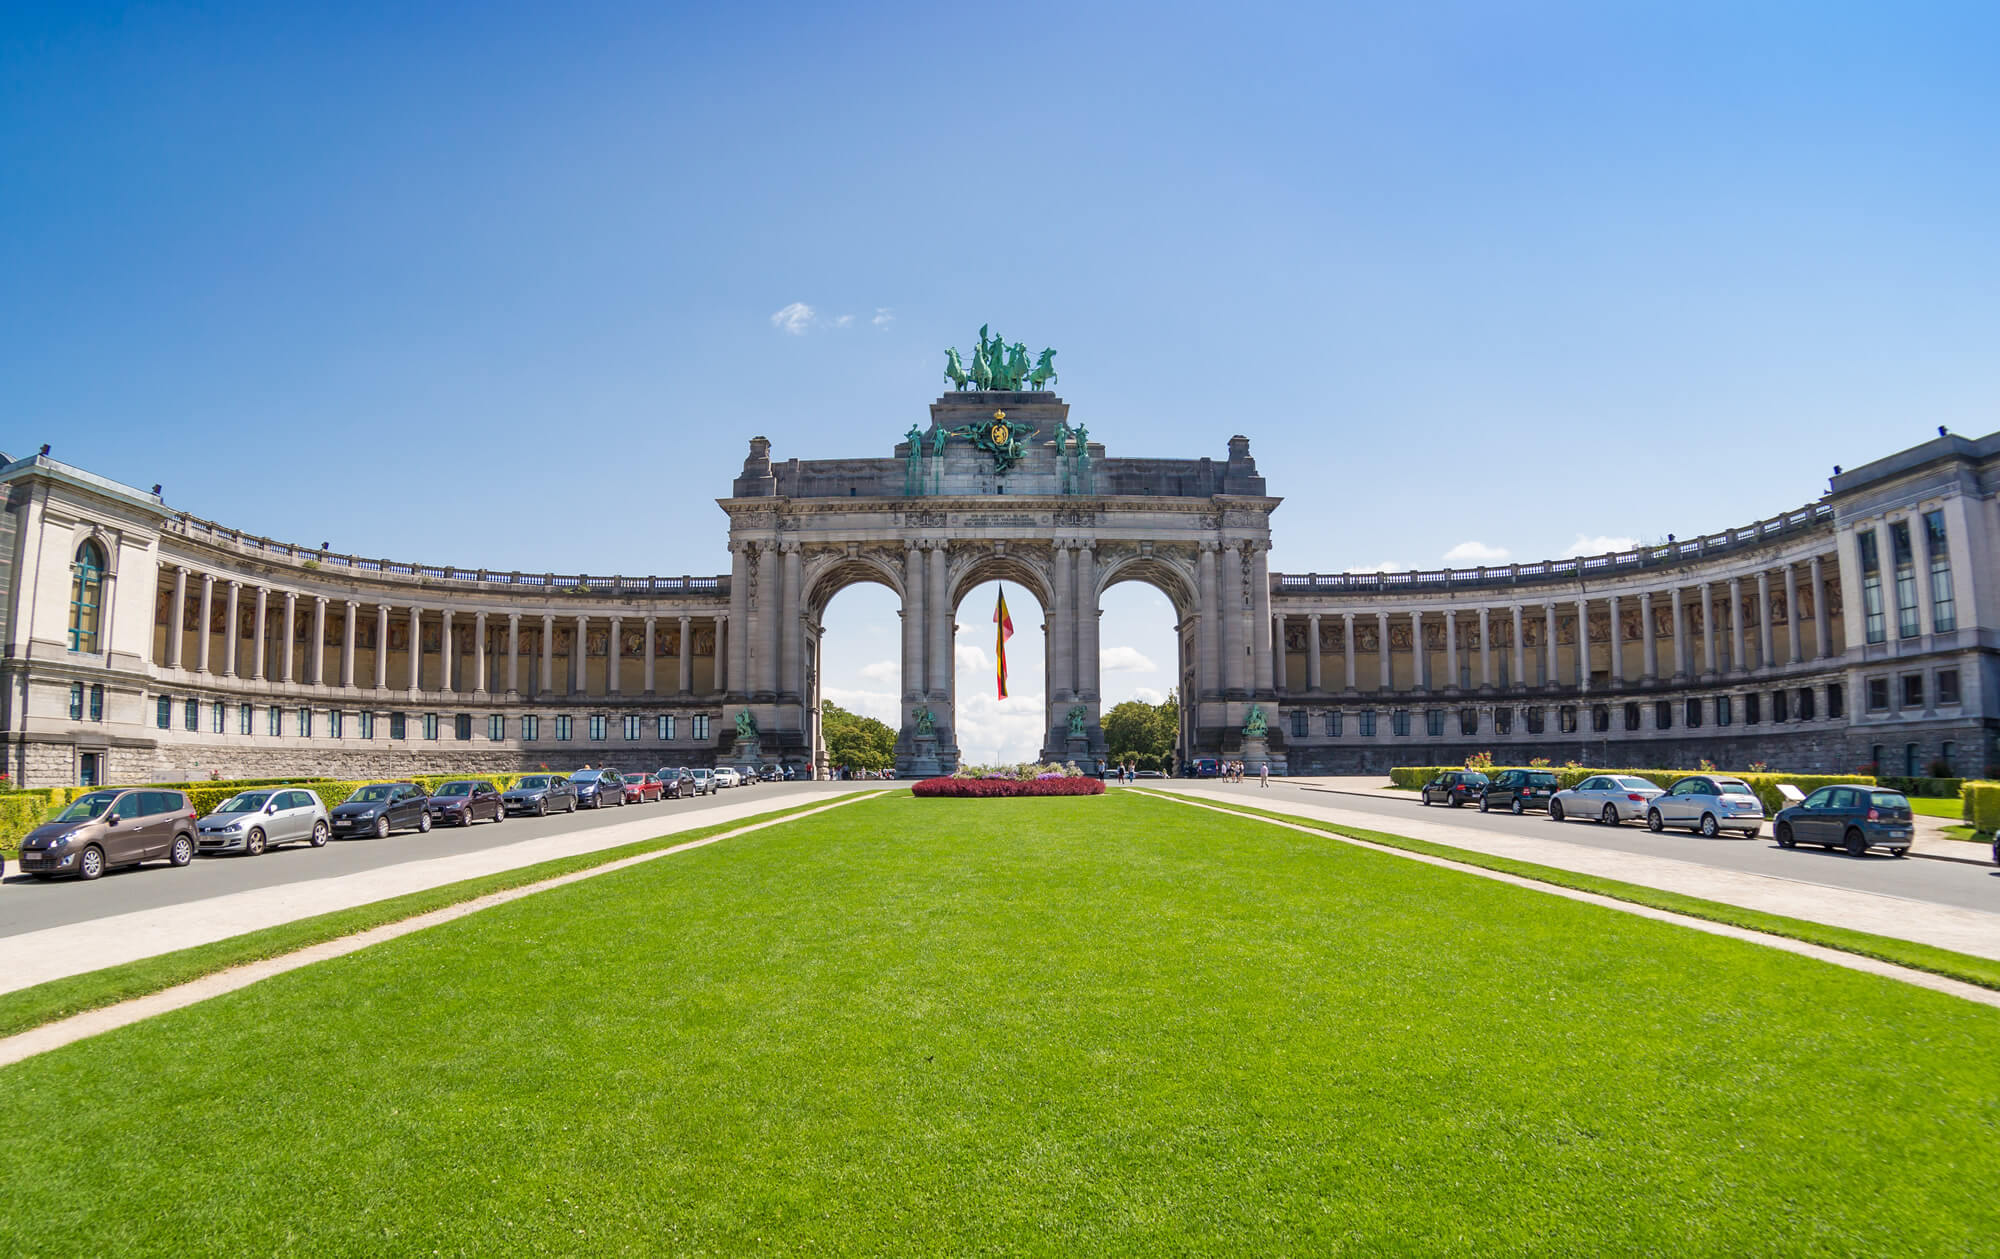 The Triumphal Arc, Brussels